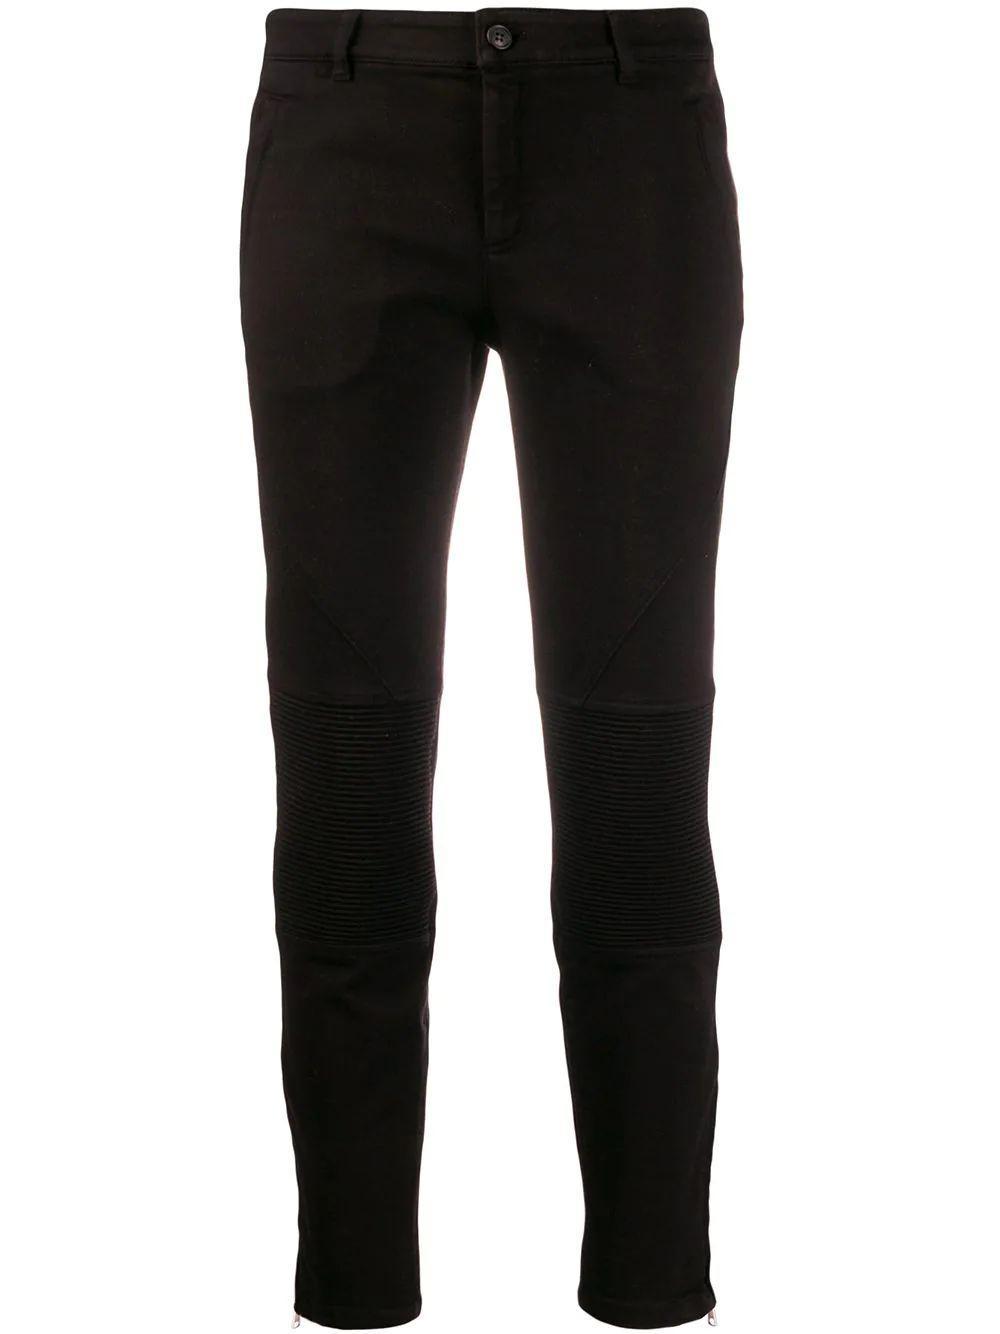 Cropped Pant Item # B021-0414-9000